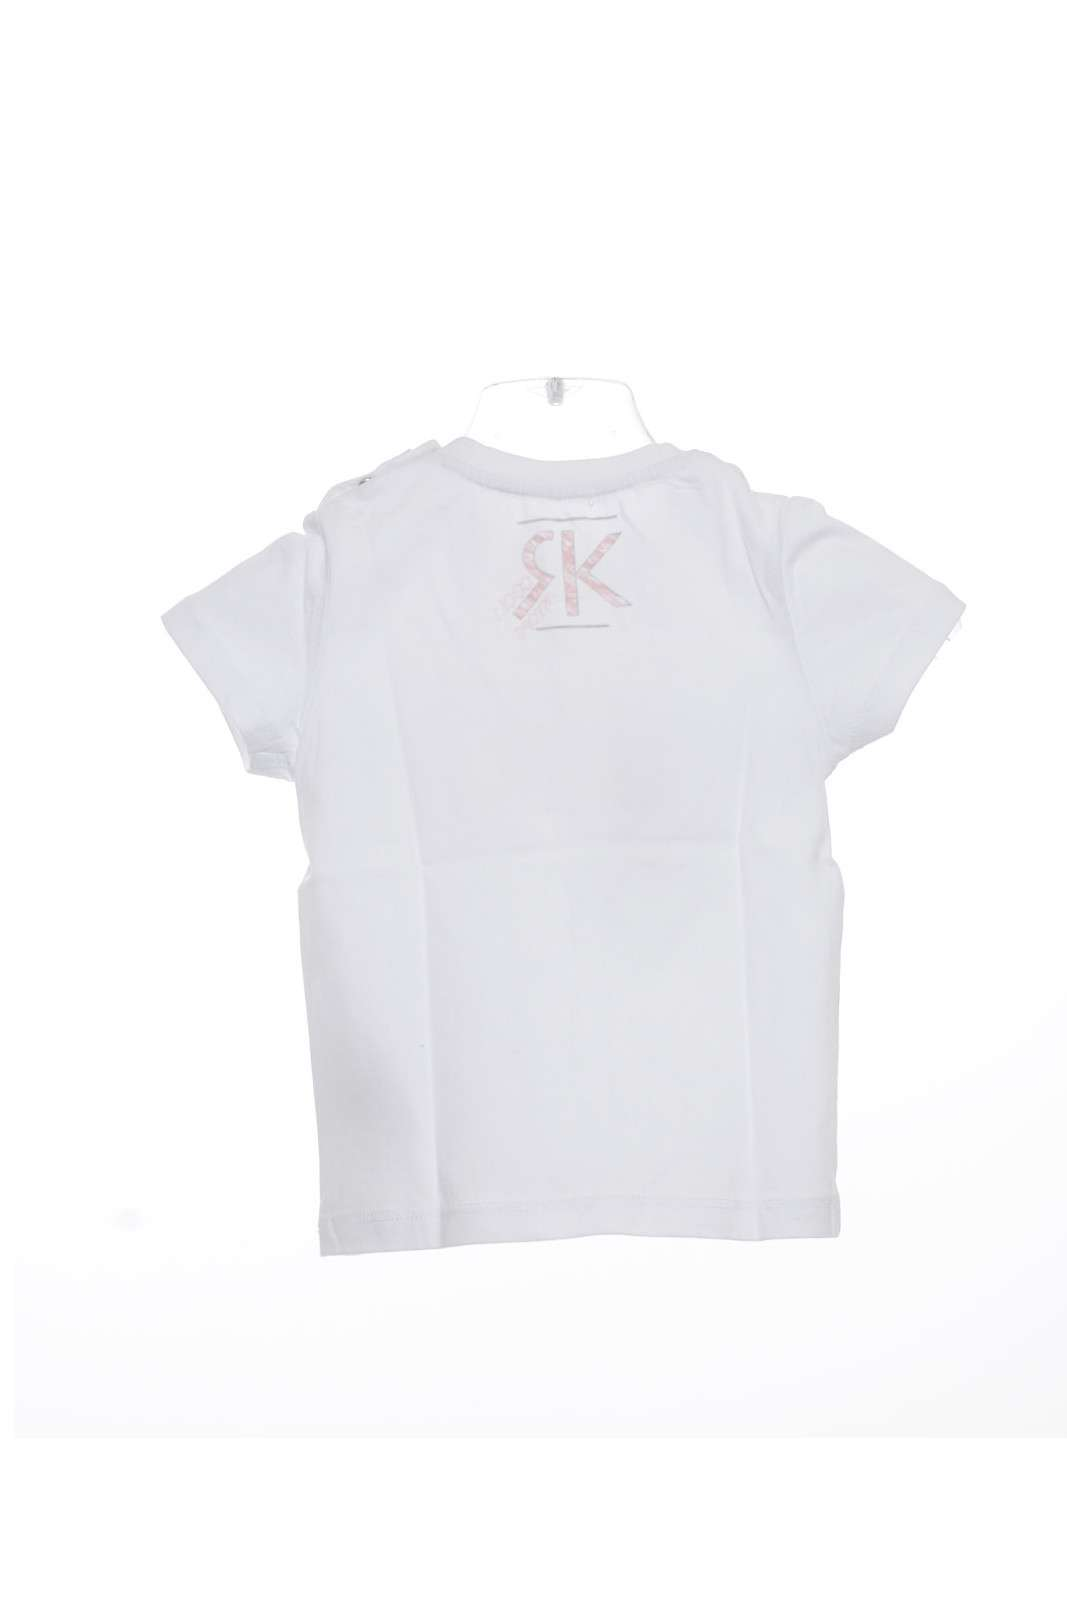 /media/catalog/product/a/i/PE-outlet_parmax-t-shirt-bambino-Ronnie-Kay-RK1647-B.jpg